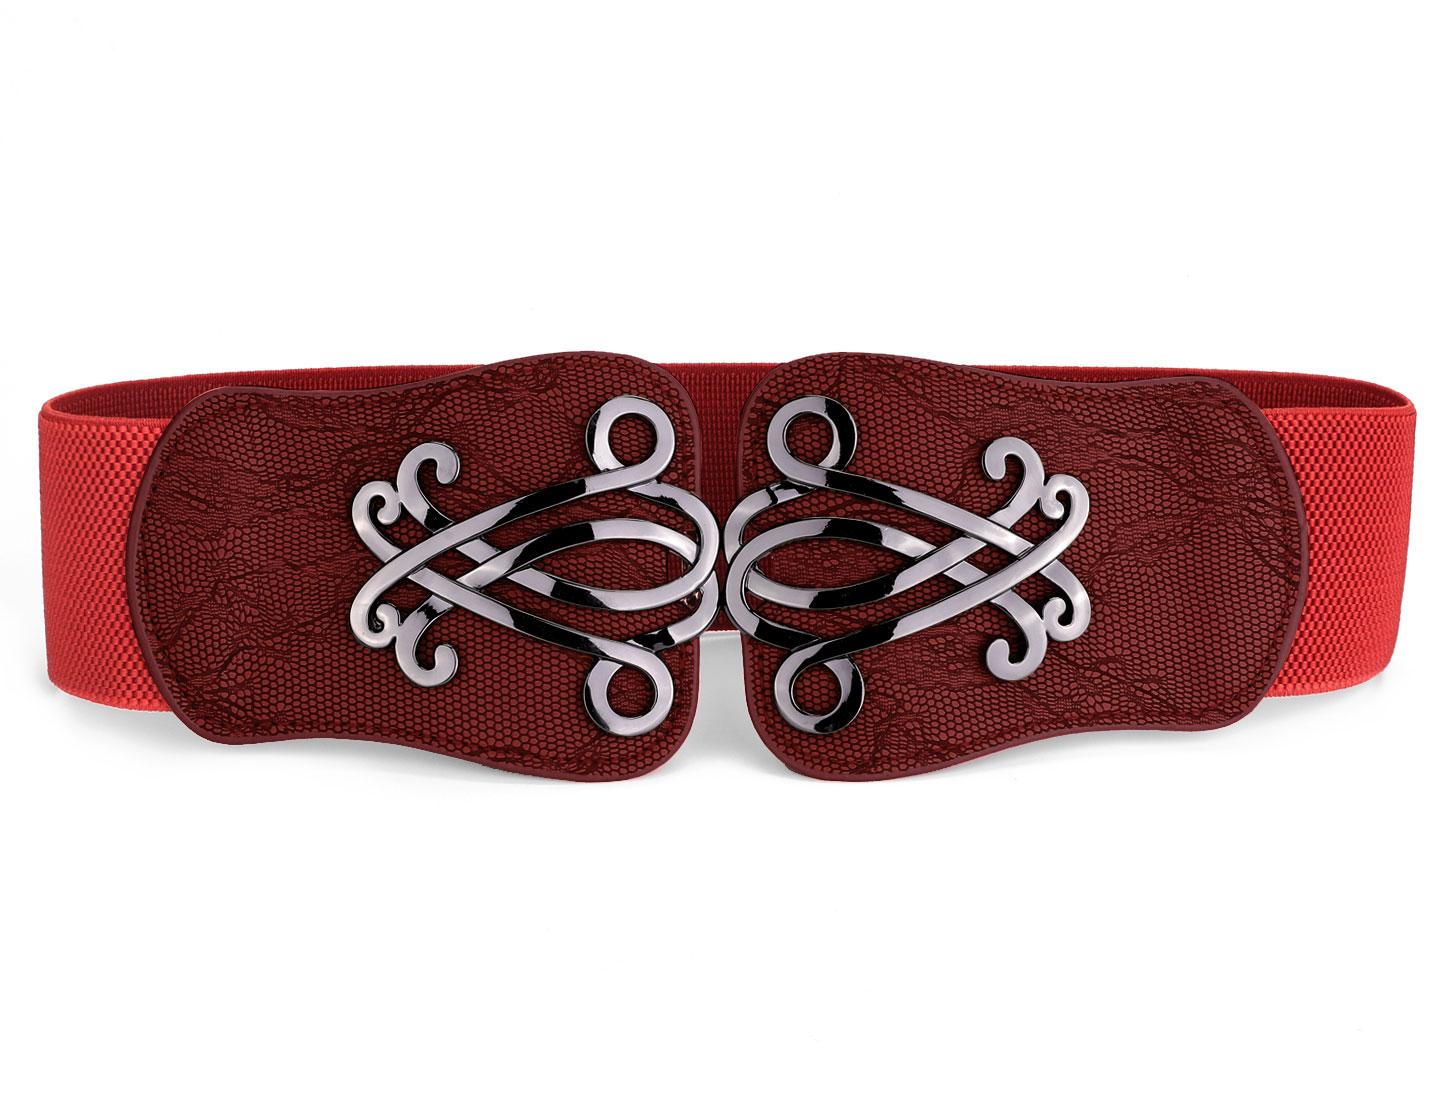 Snake Print Faux Leather Interlocking Buckle Elastic Cinch Belt Red for Women